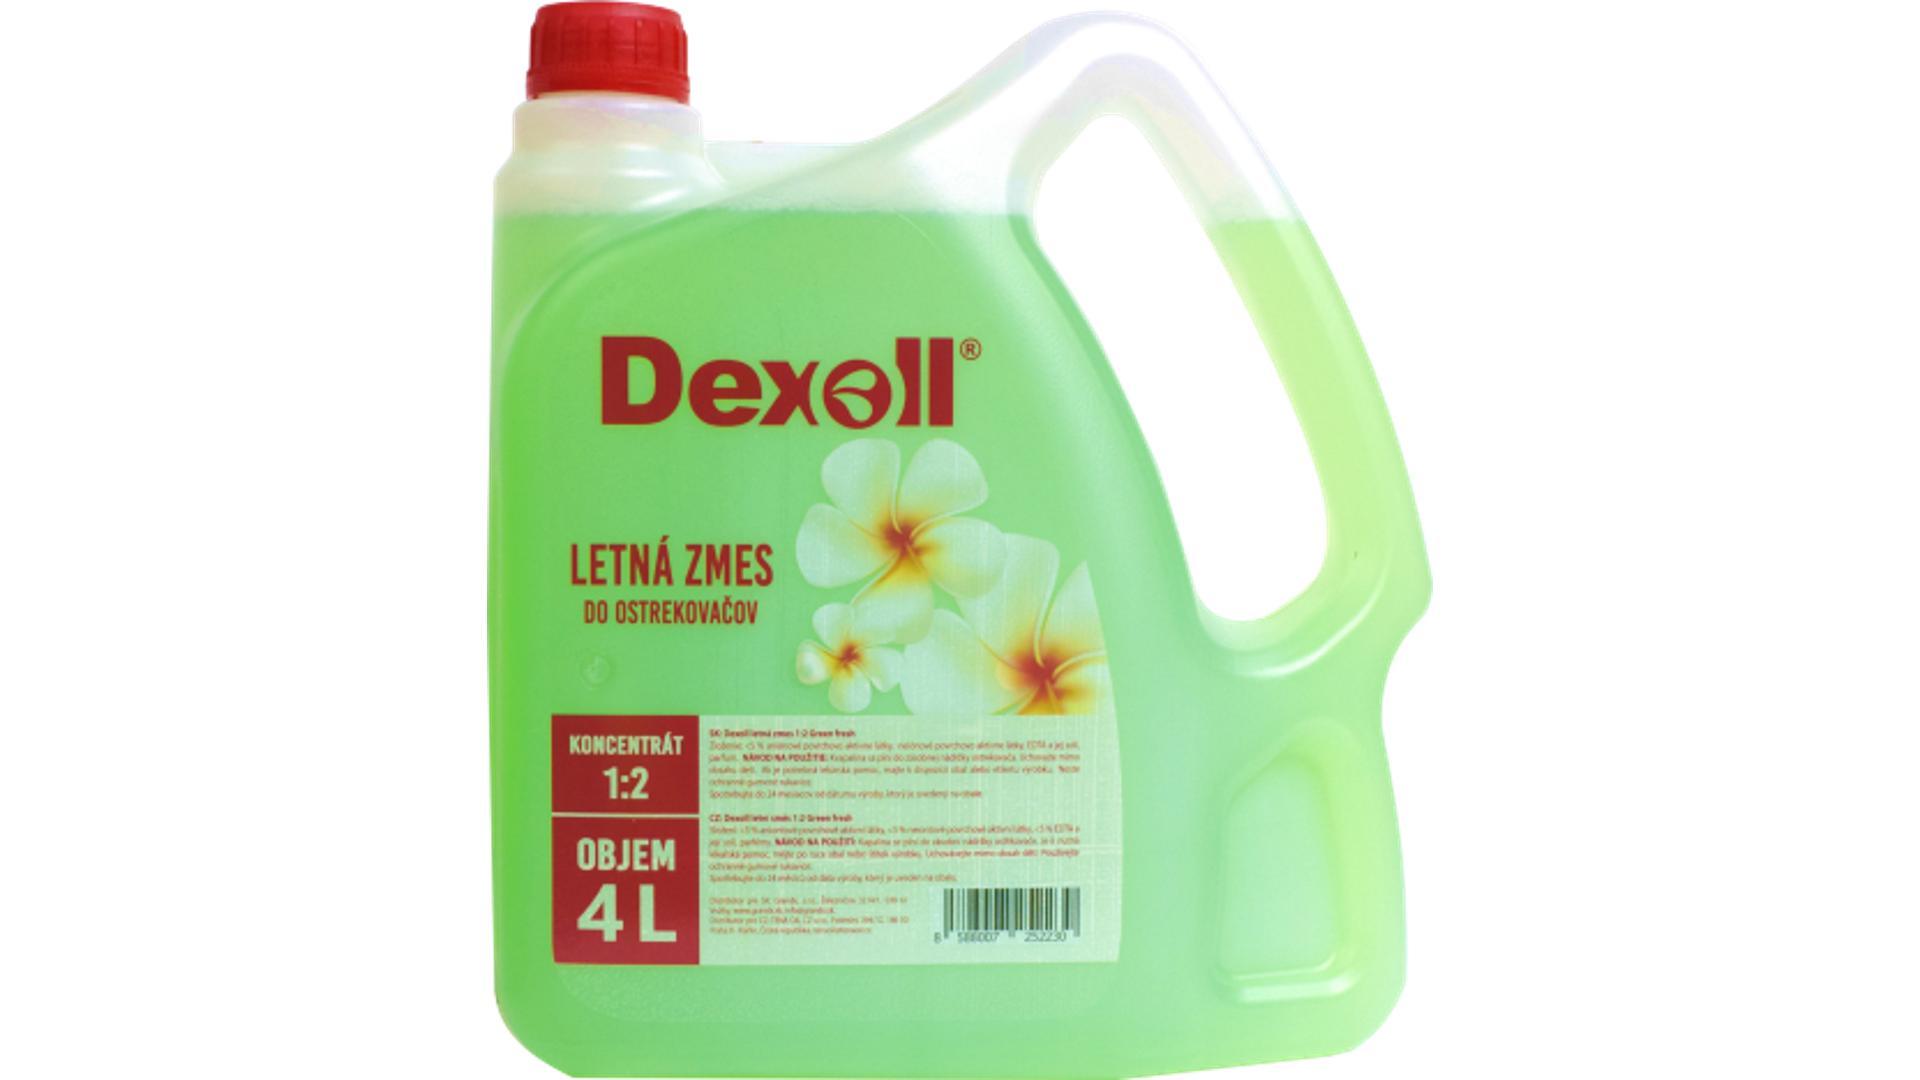 DEXOLL Letná Zmes 4L Green Fresh 1:2